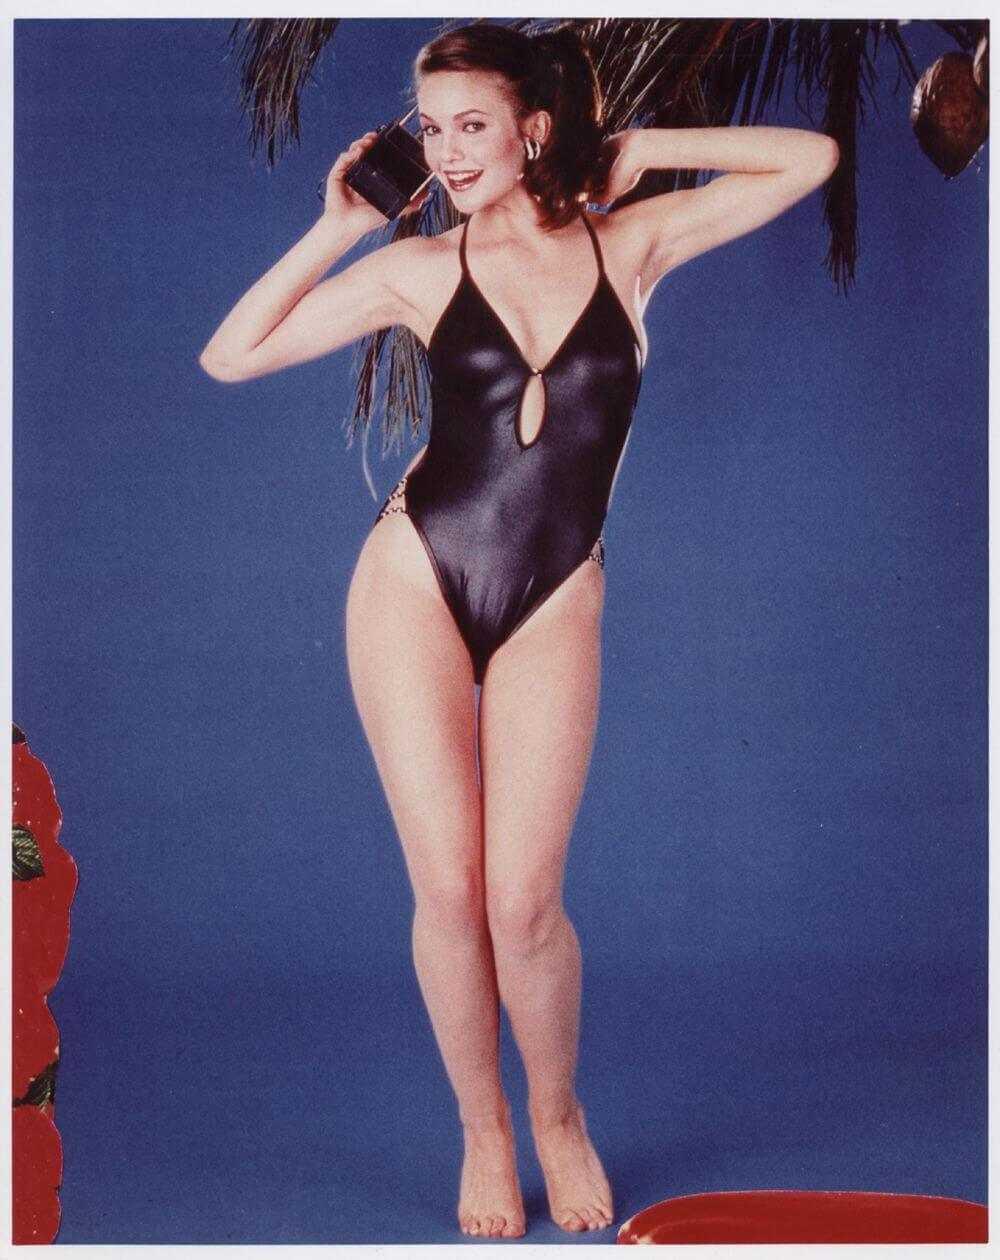 Diane Lane lingerie pics